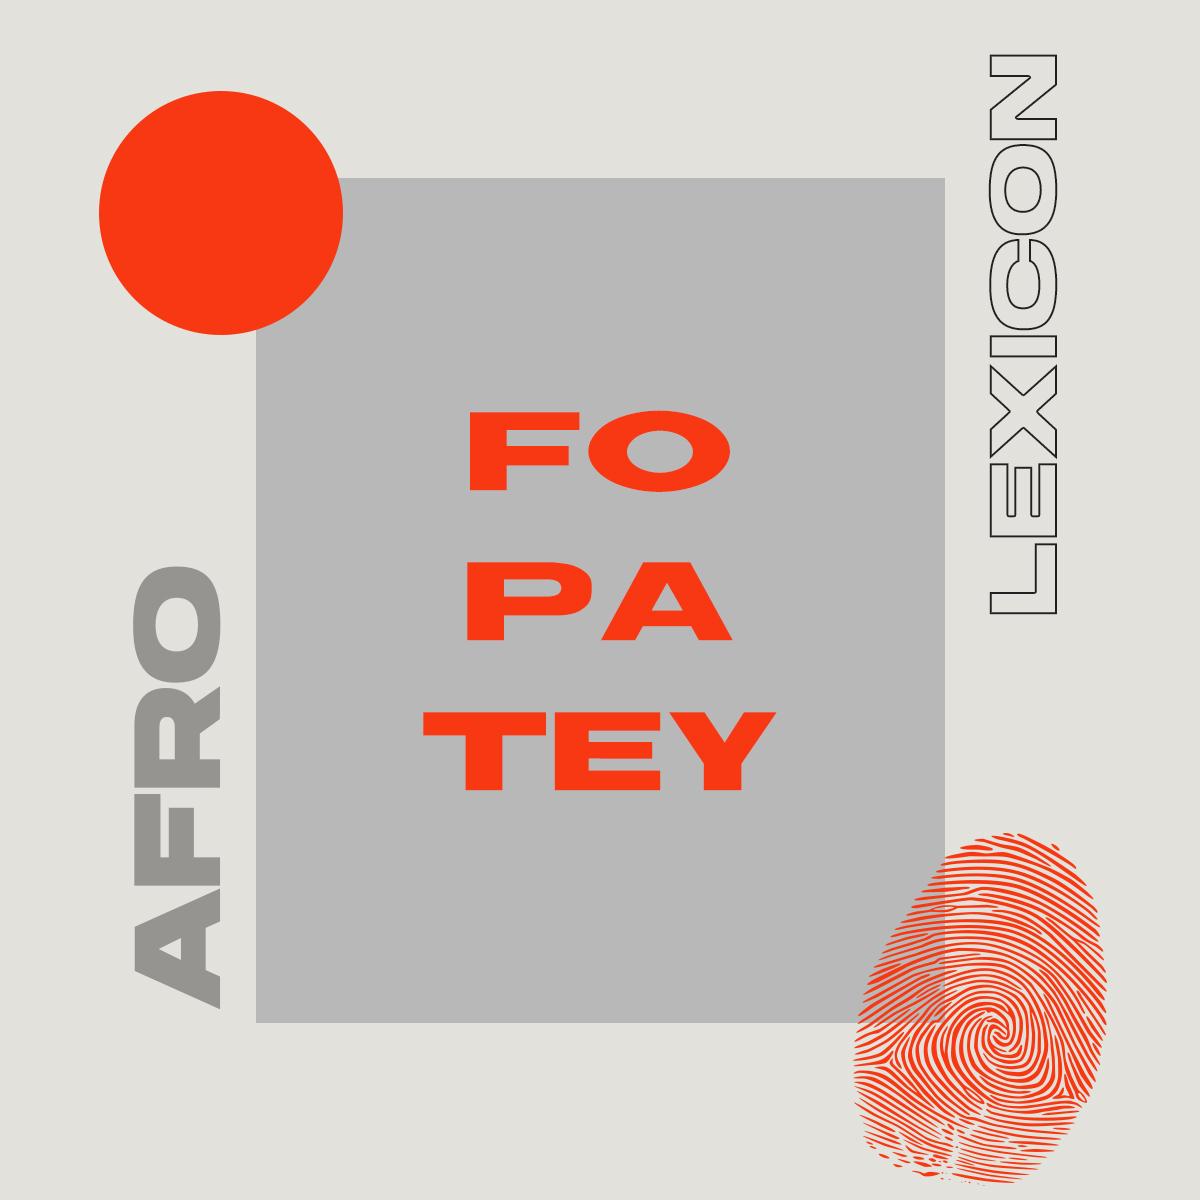 FO PAS TEY V2